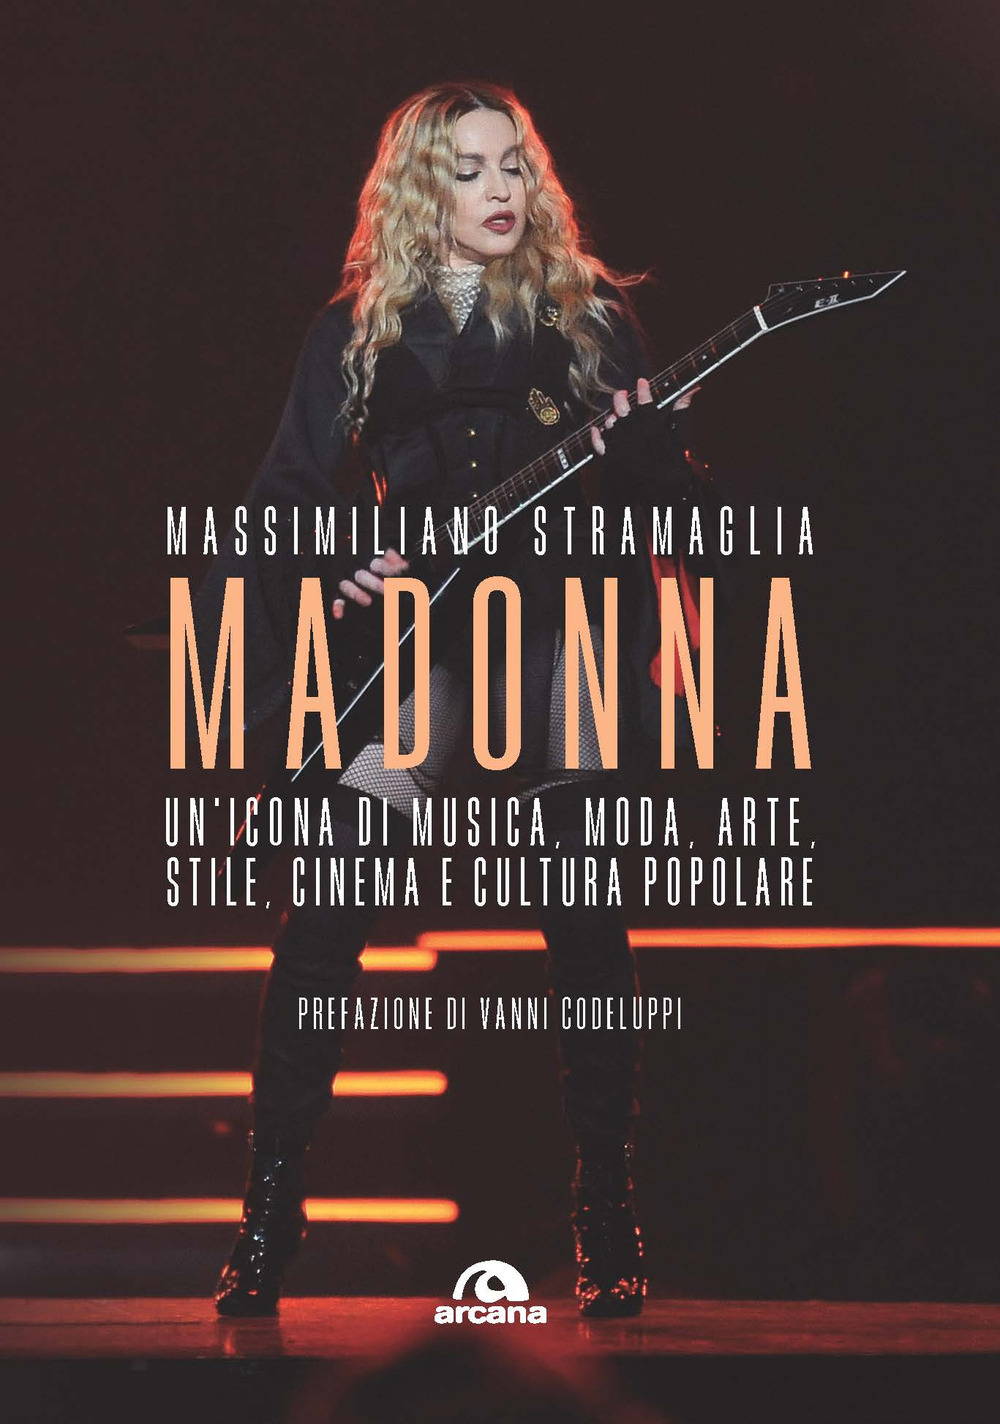 MADONNA - MASSIMILIANO STRAMAGLIA - 9788862318143